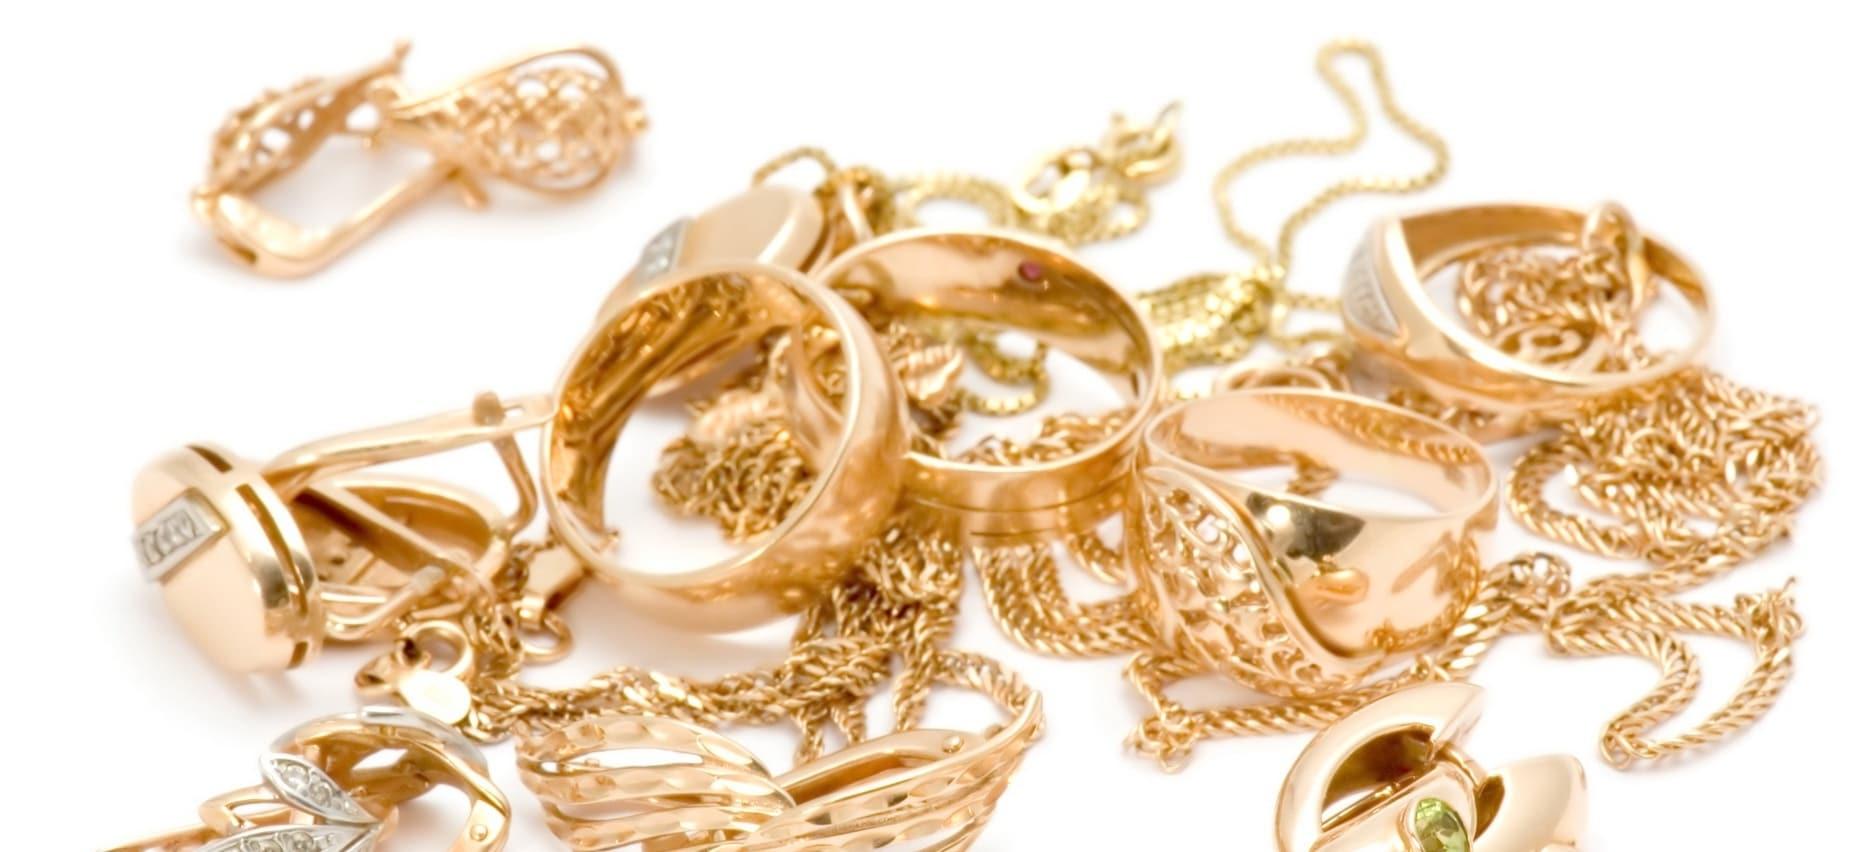 jewelry wallpaper